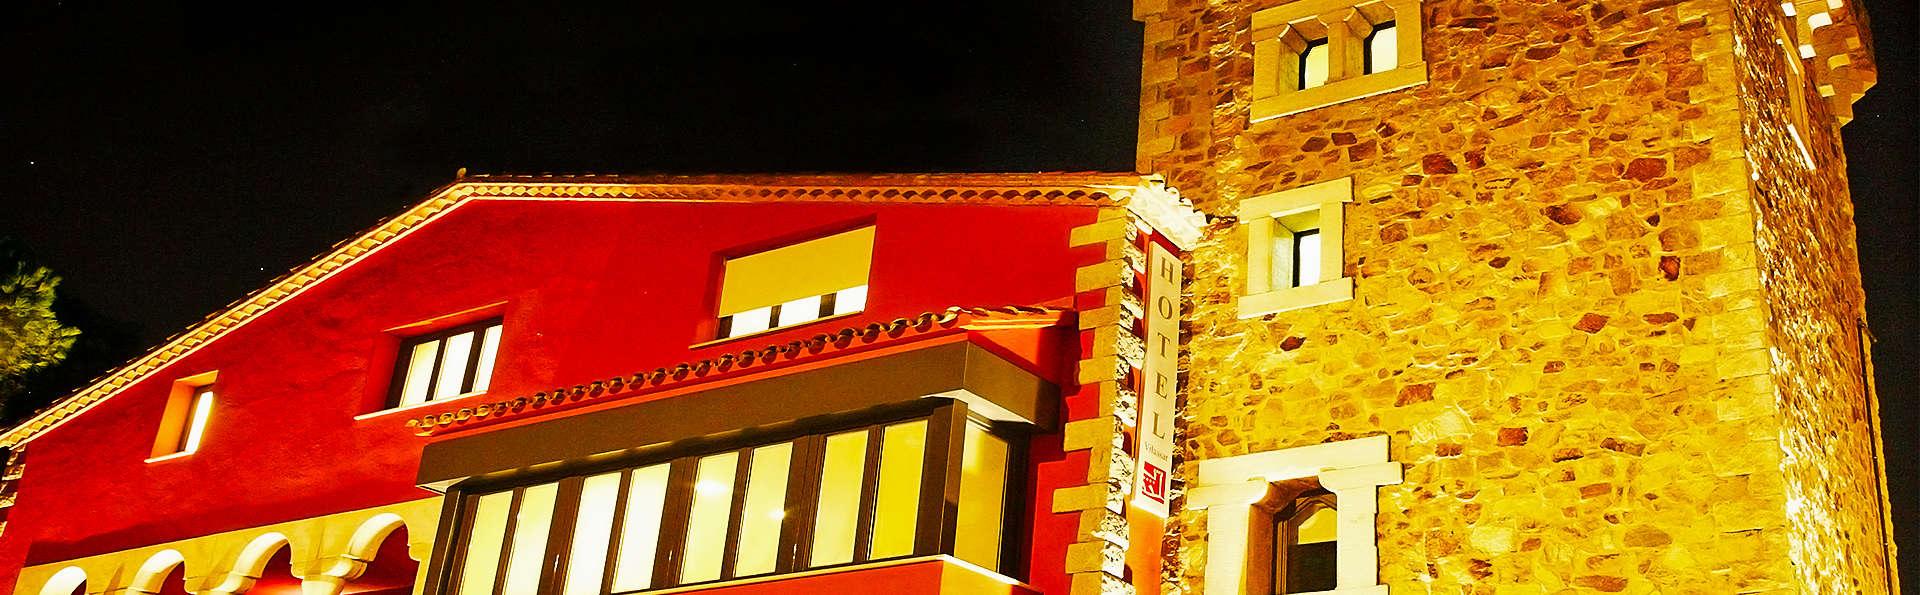 Hotel Vilassar - EDIT_1_FACHADA.jpg